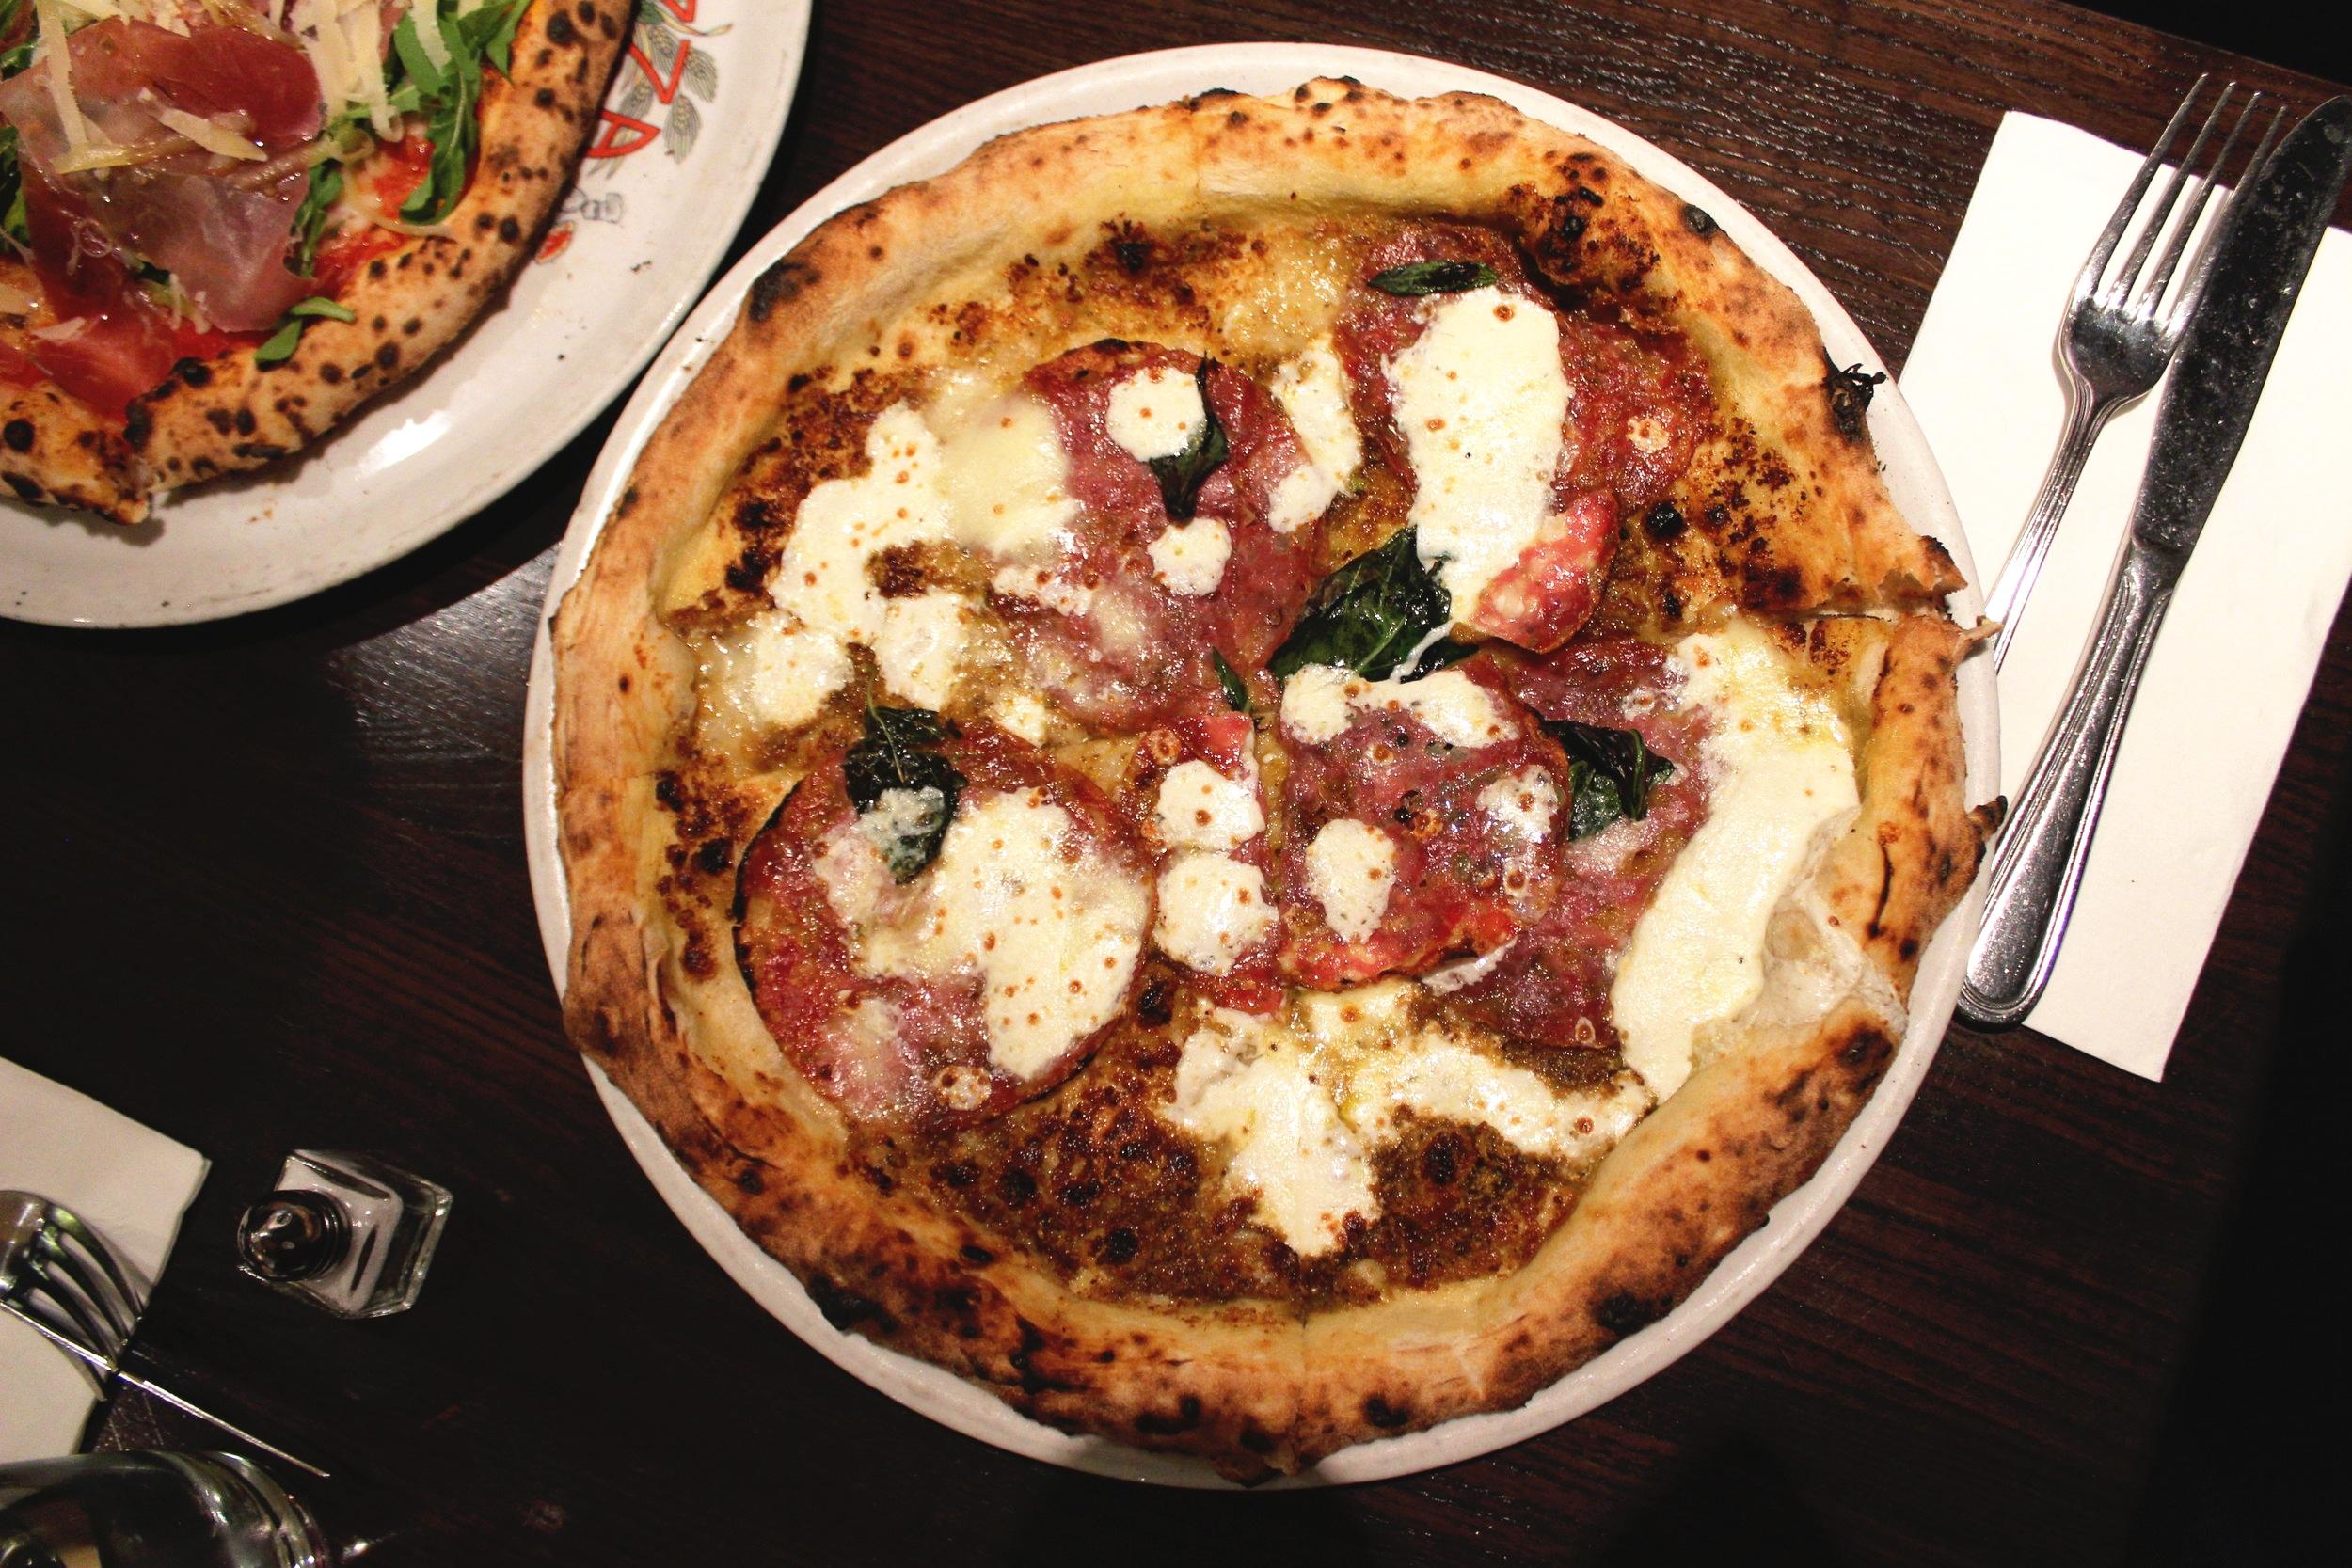 Pistacchio e Salsiccia: Fresh Pistacchio Pesto, Sausage, Homemade Mozzarella, Pecorino Romano, Basil, EV Olive Oil at Keste